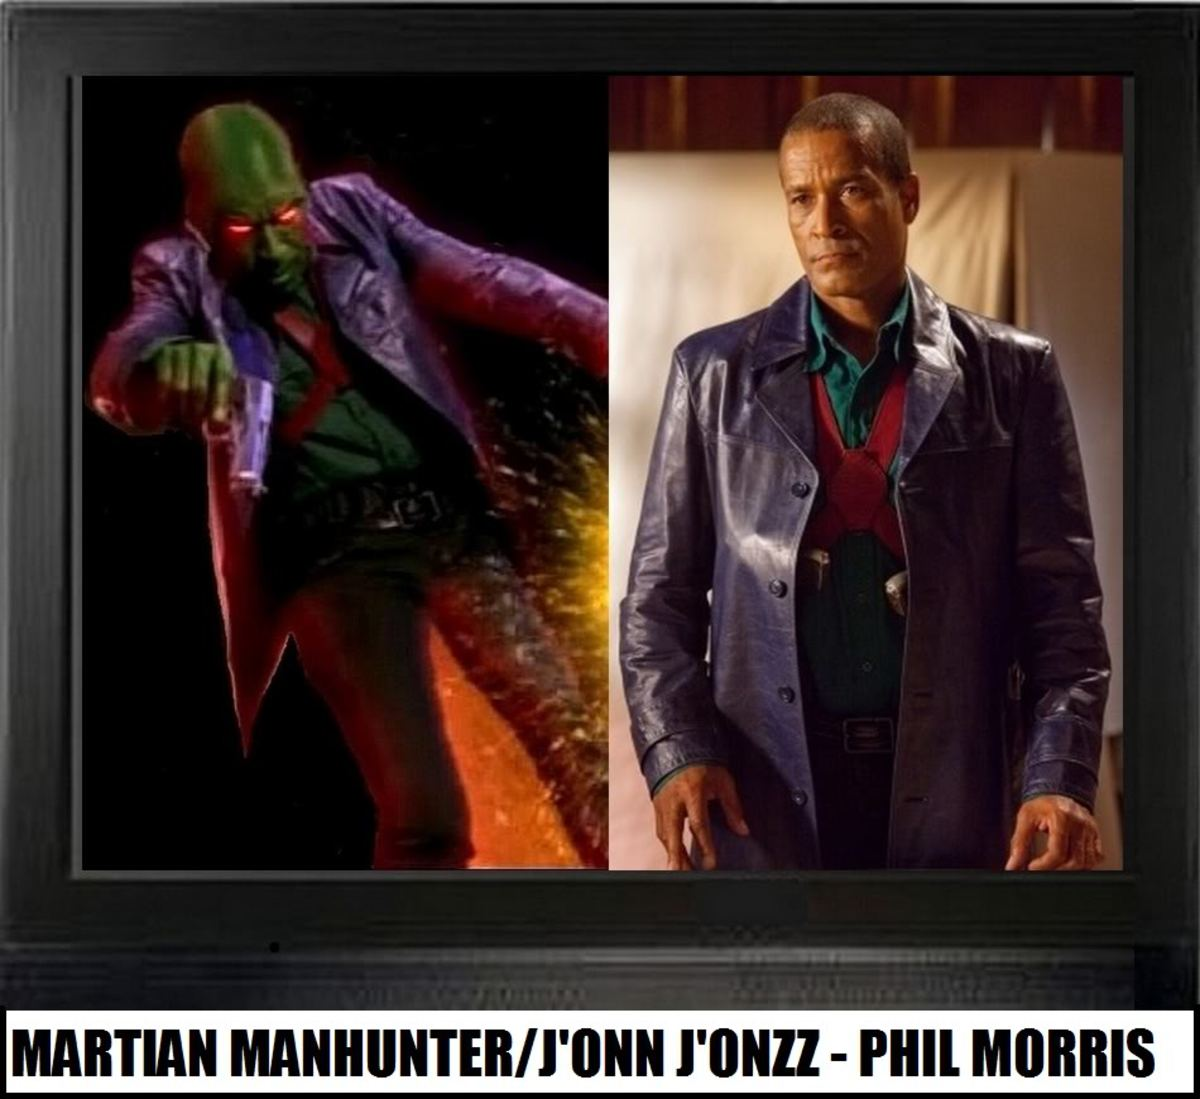 Phil Morris as Martian Manhunter